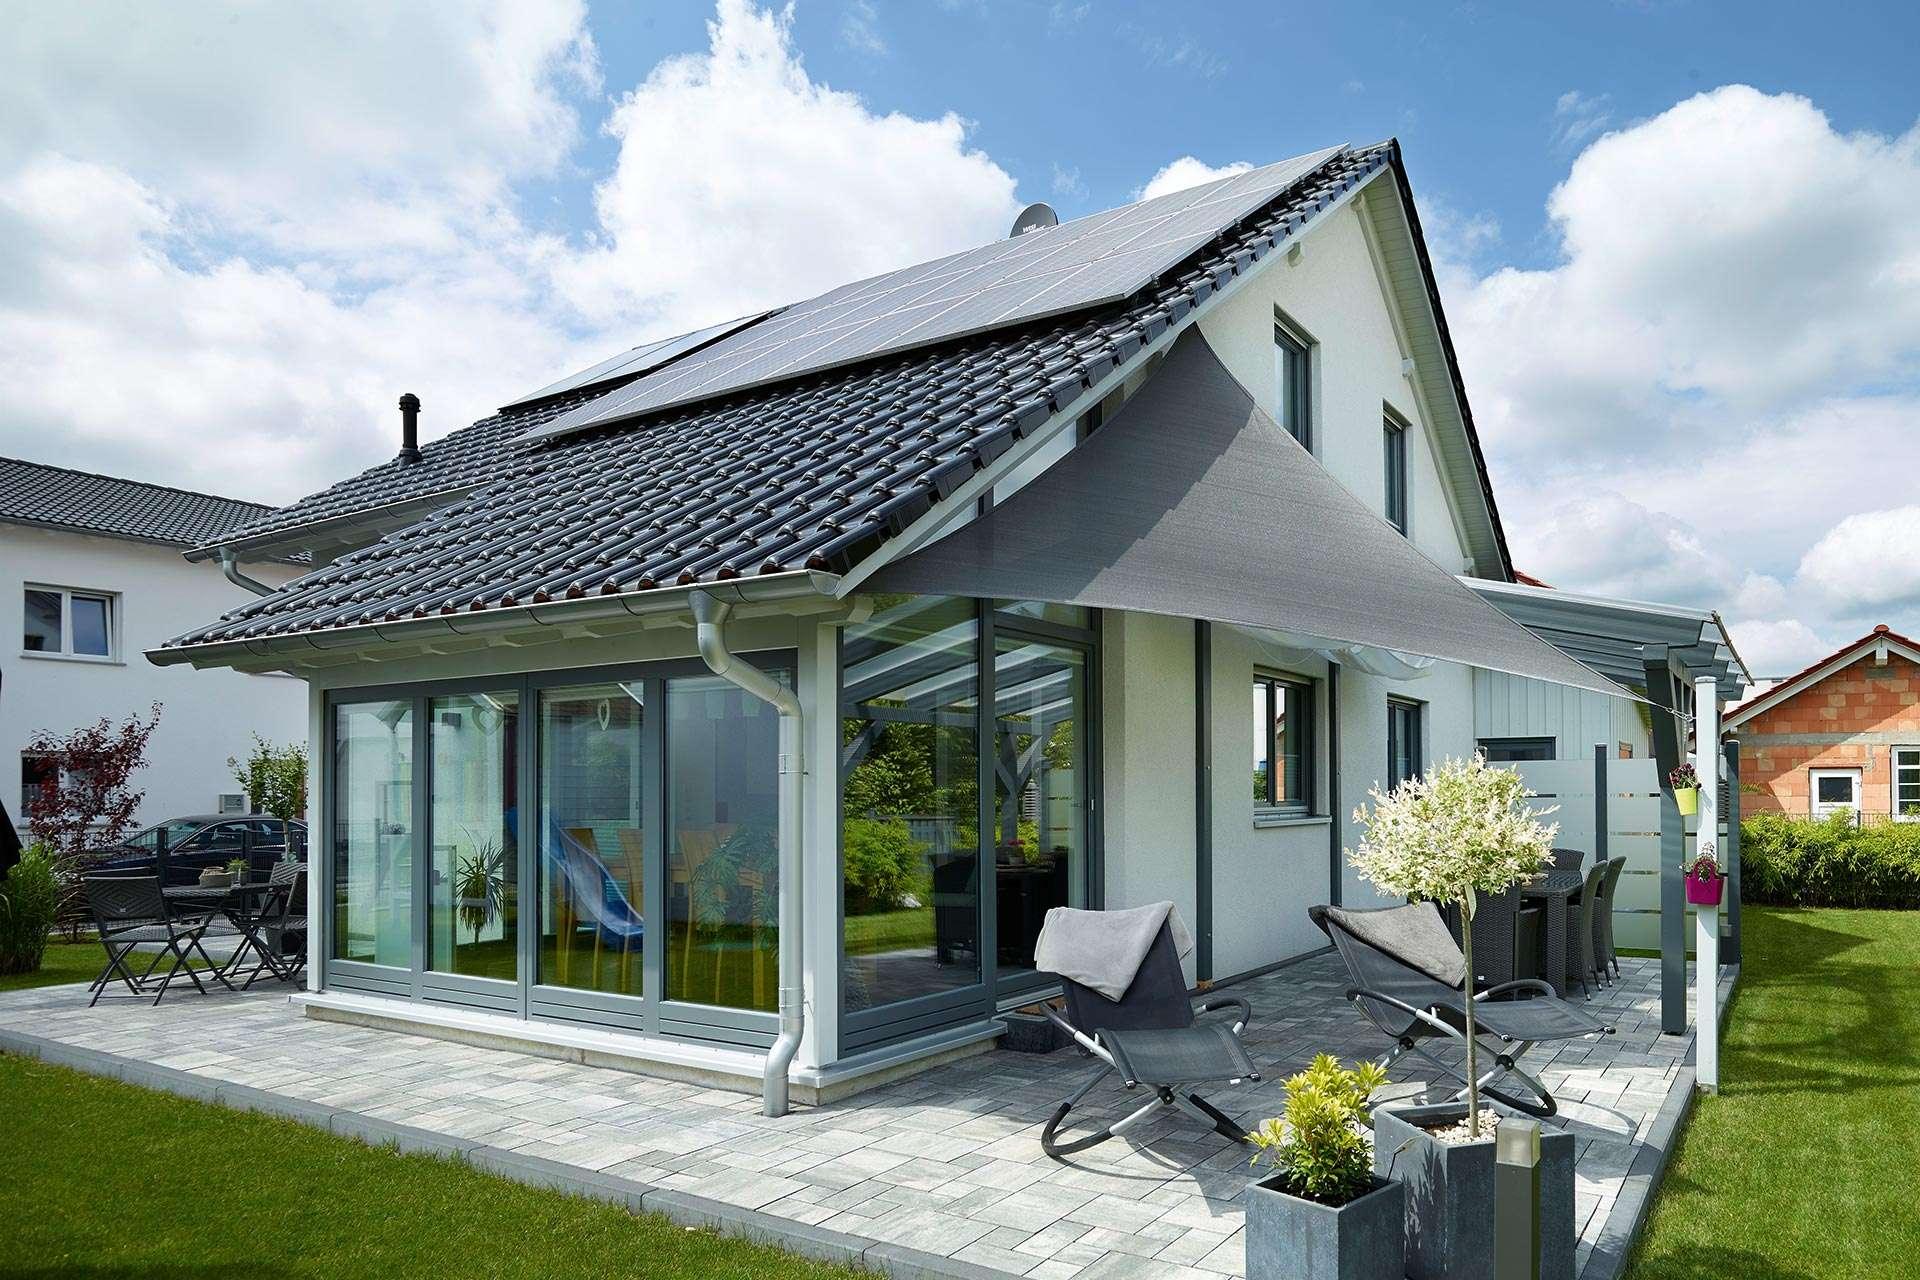 gussek haus einfamilienhaus modell sonnenh gel. Black Bedroom Furniture Sets. Home Design Ideas